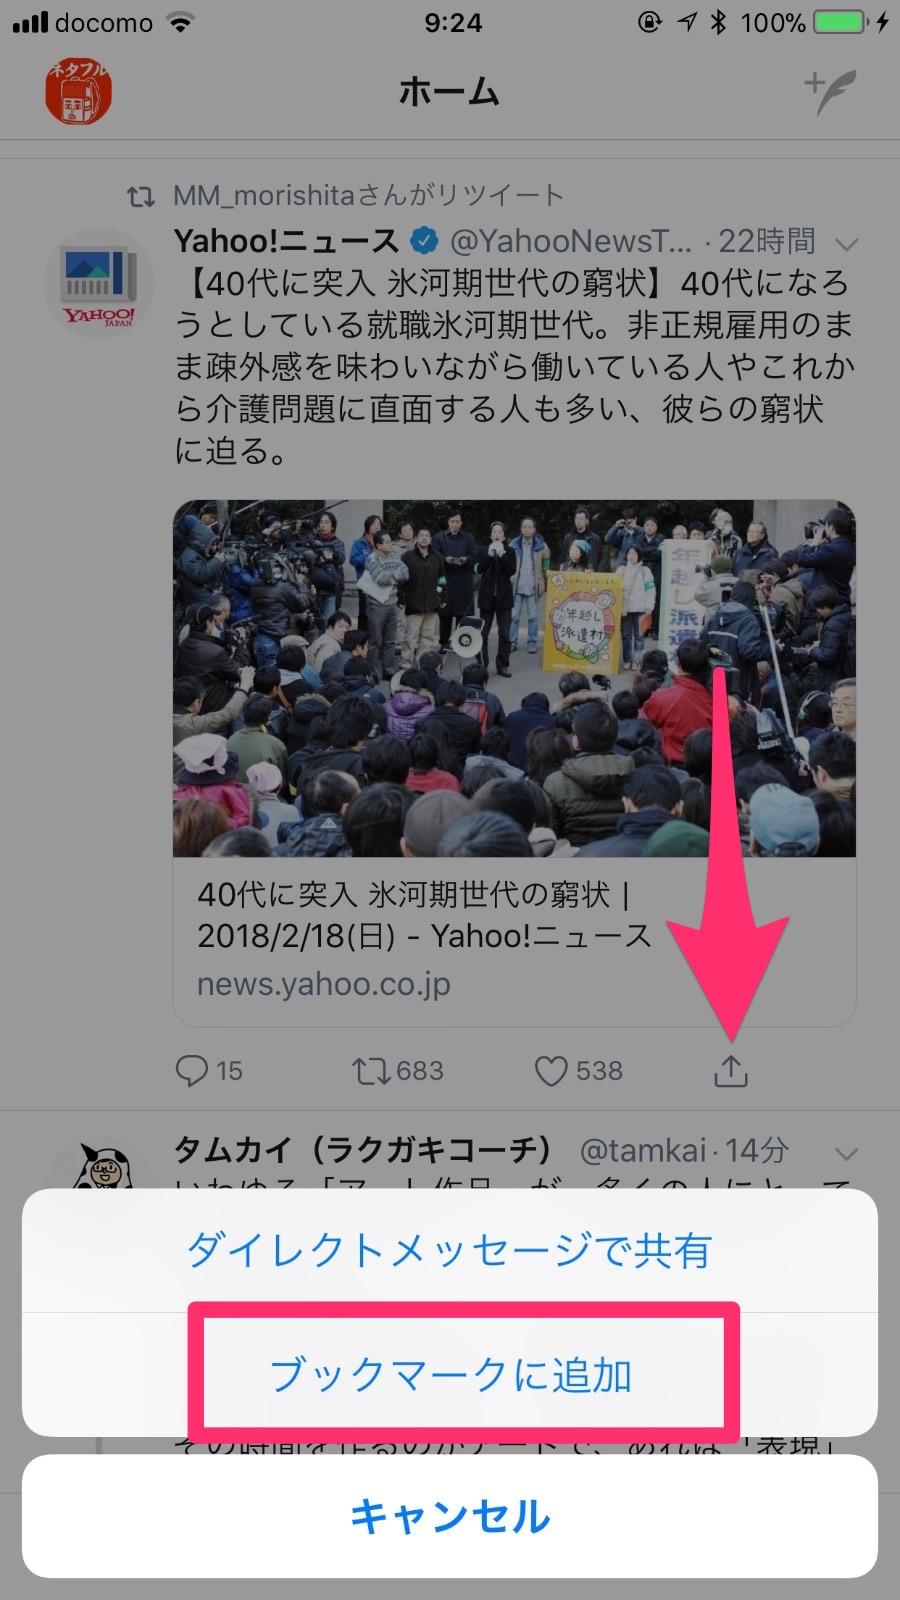 【Twitter】ブックマーク機能を全ユーザーに公開